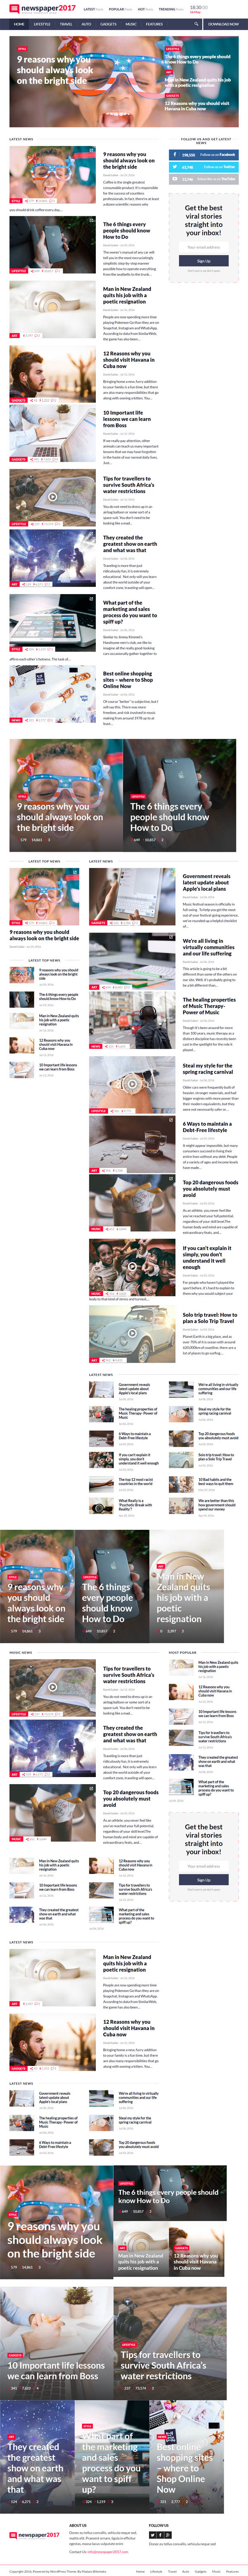 NewsPaper2017 – WordPress Theme for Blog and Magazine